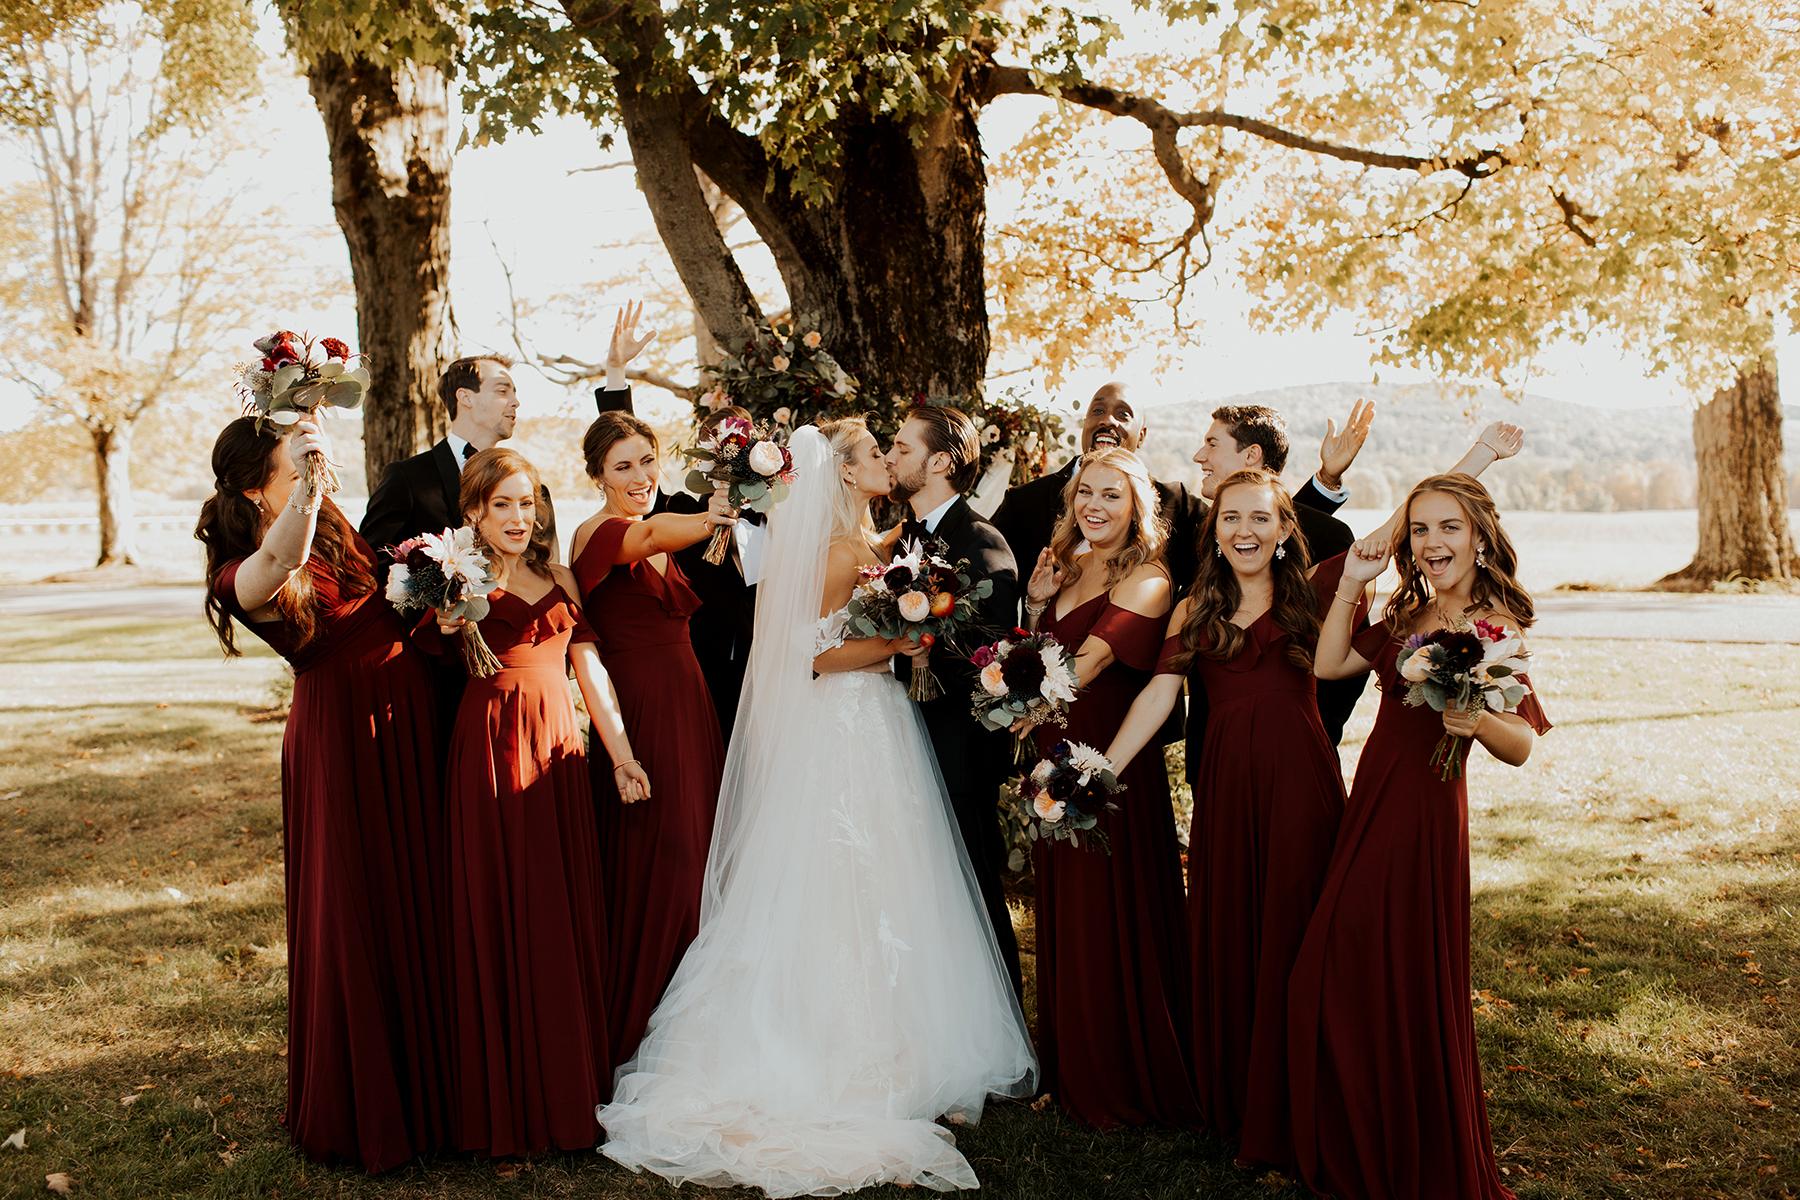 Katies Bliss Wedding Bridal Party Photos